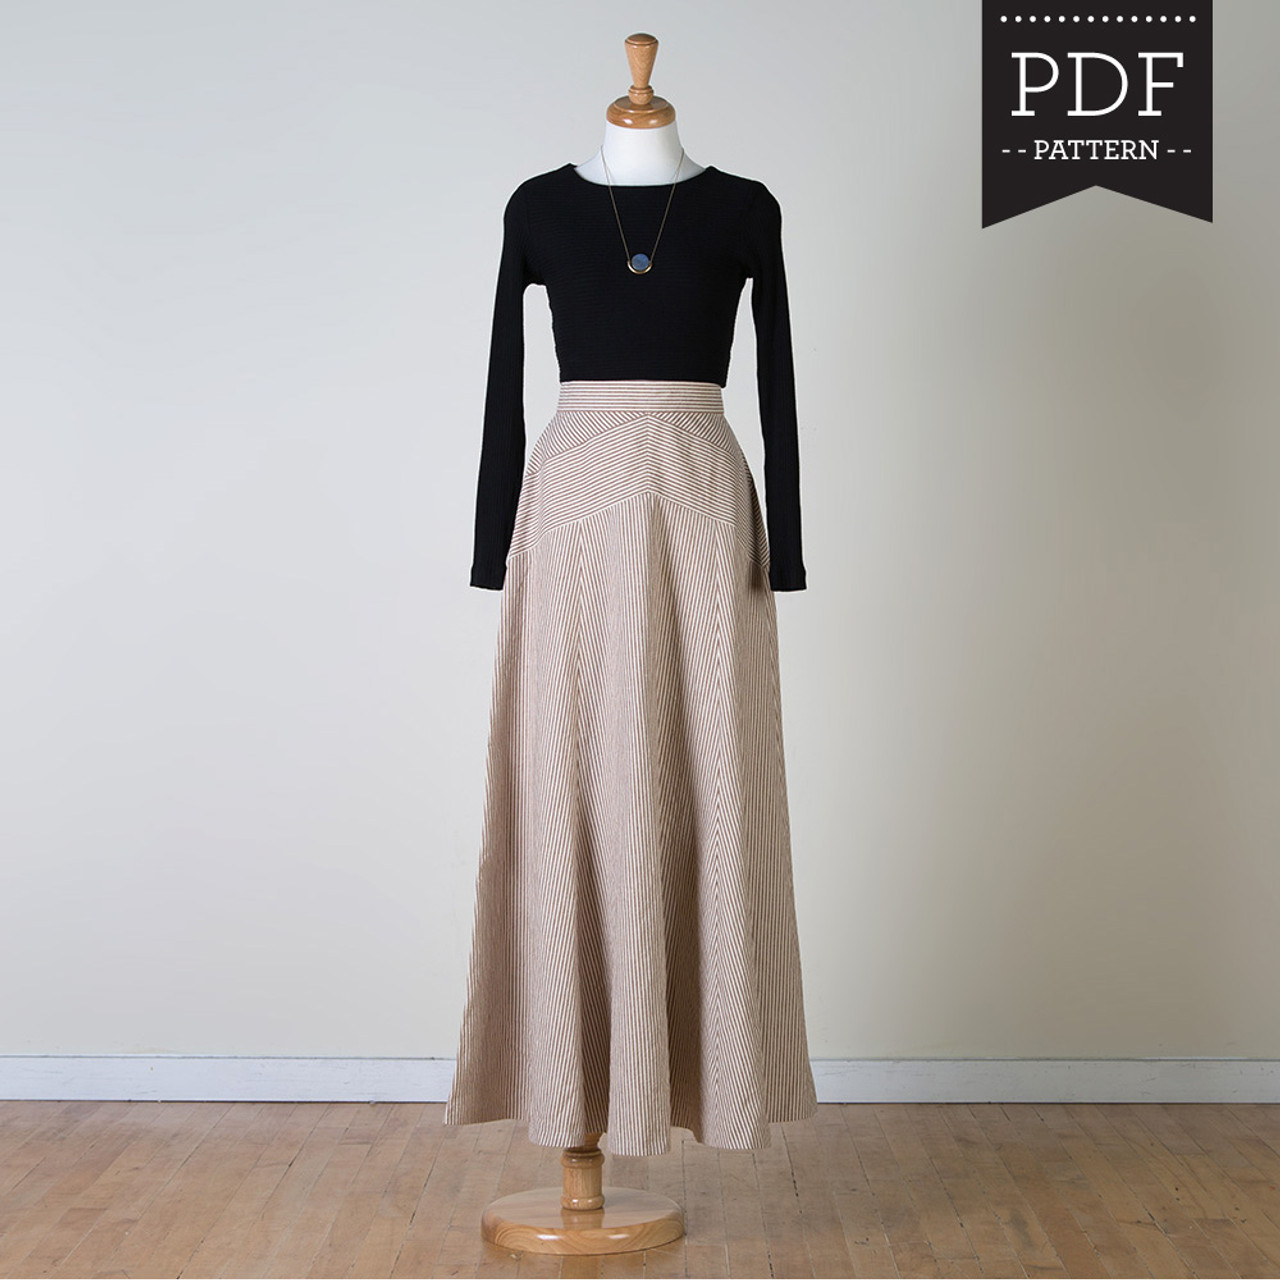 Gabriola skirt sewing pattern by Sewaholic Patterns, gorgeous maxi ...